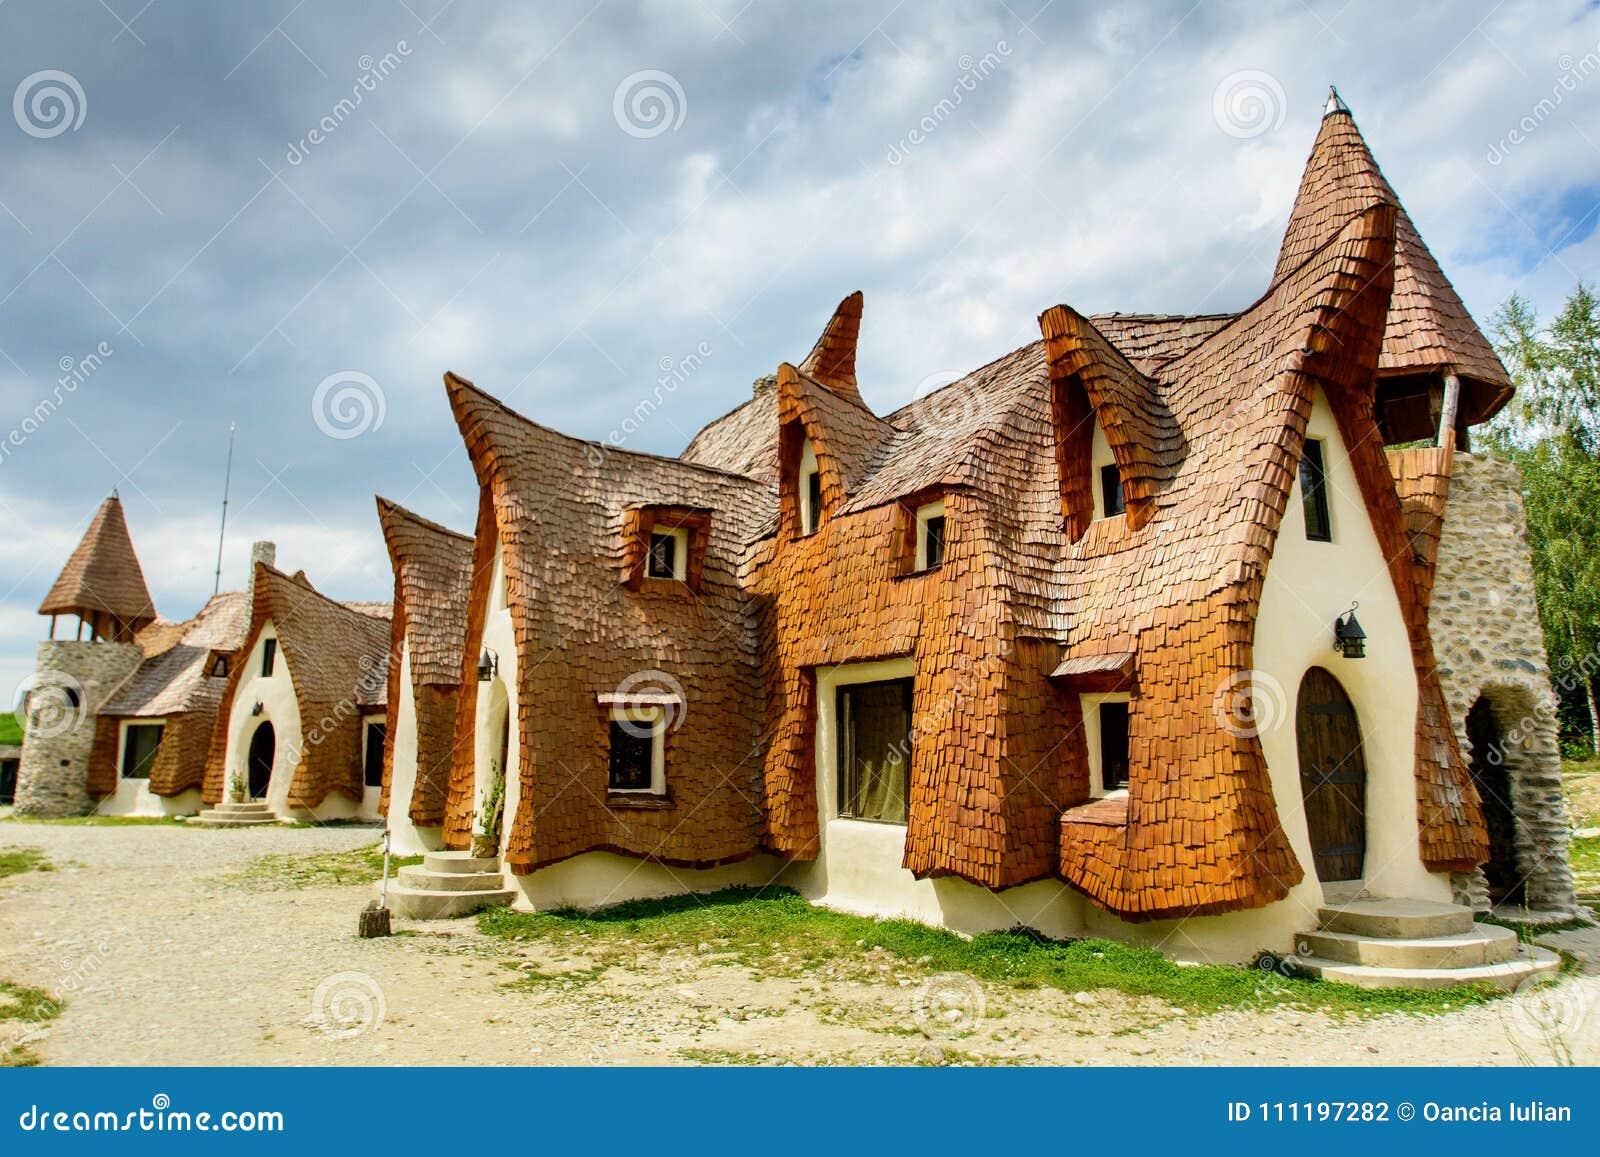 Clay castle from Porumbacu de Sus village, Sibiu, Transylvania,. Romania